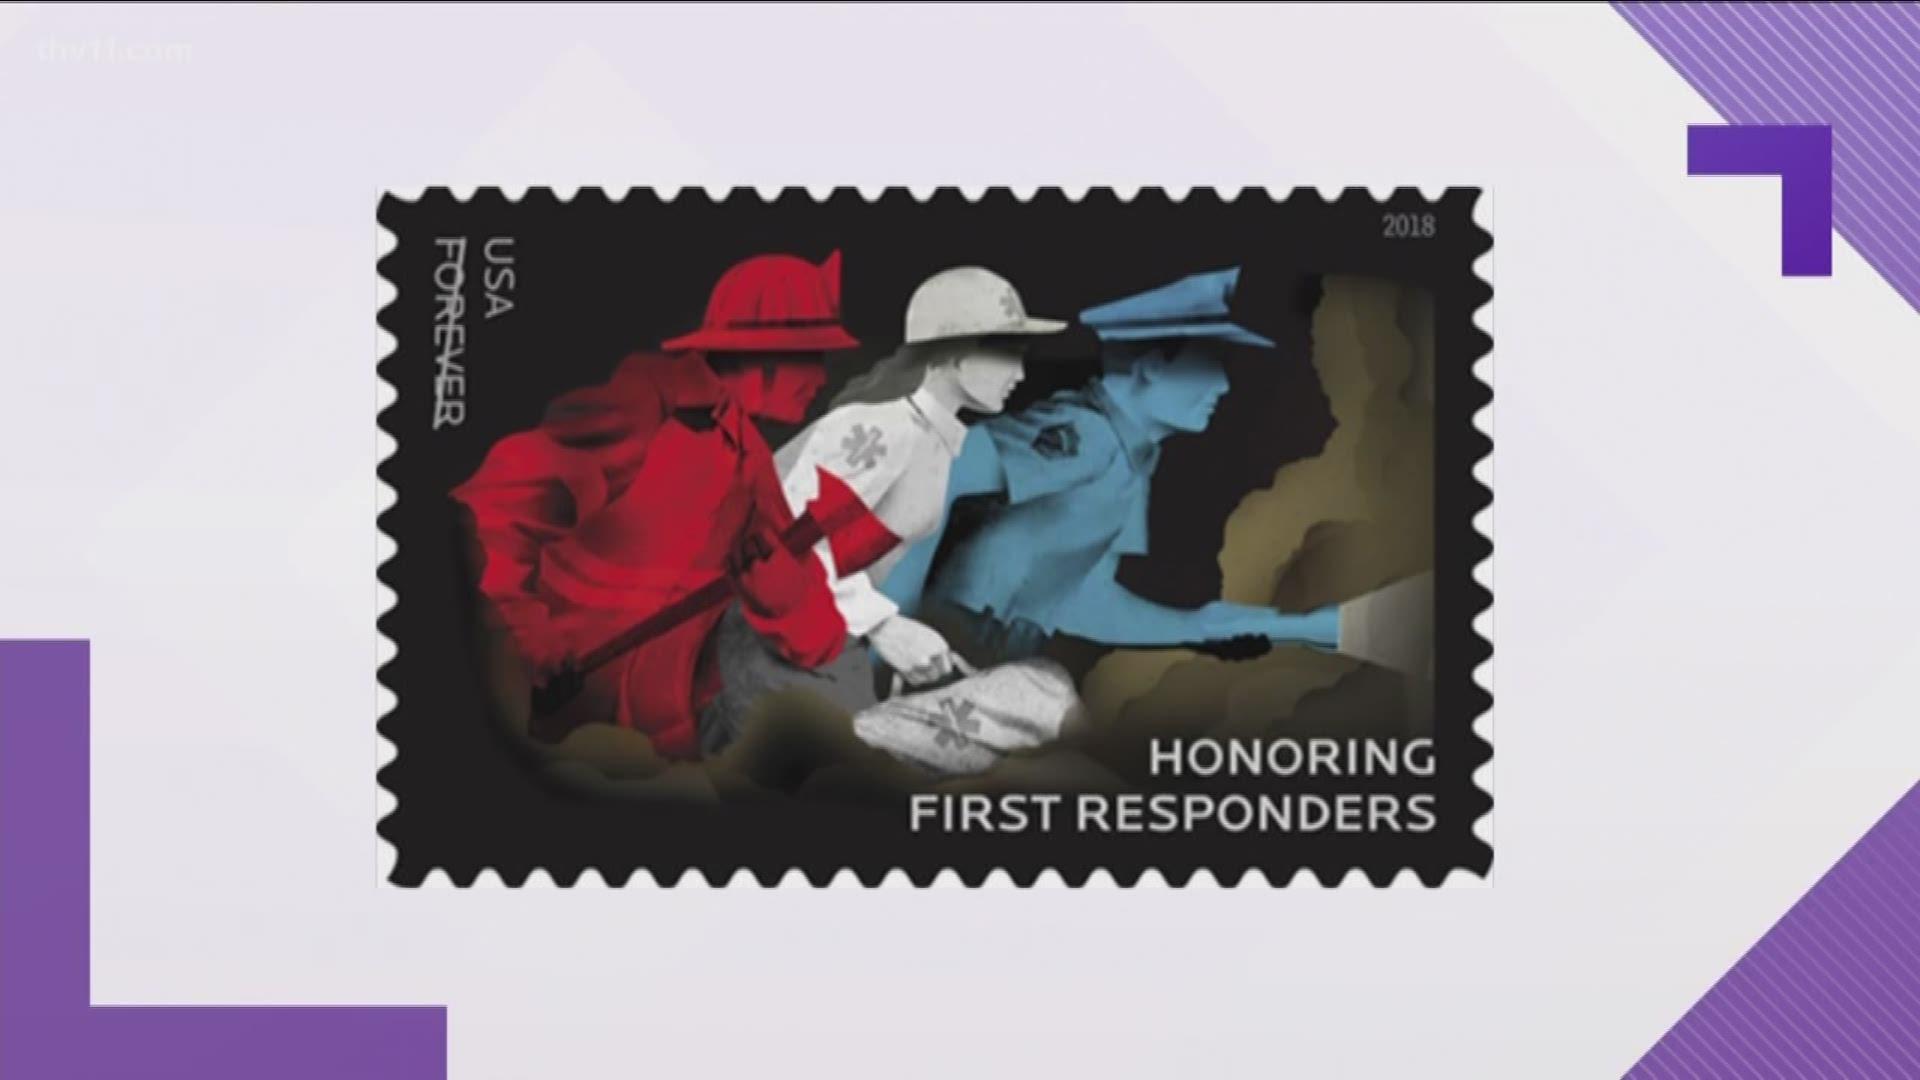 U S Postal Service Releases New Forever Stamp Kagstv Com